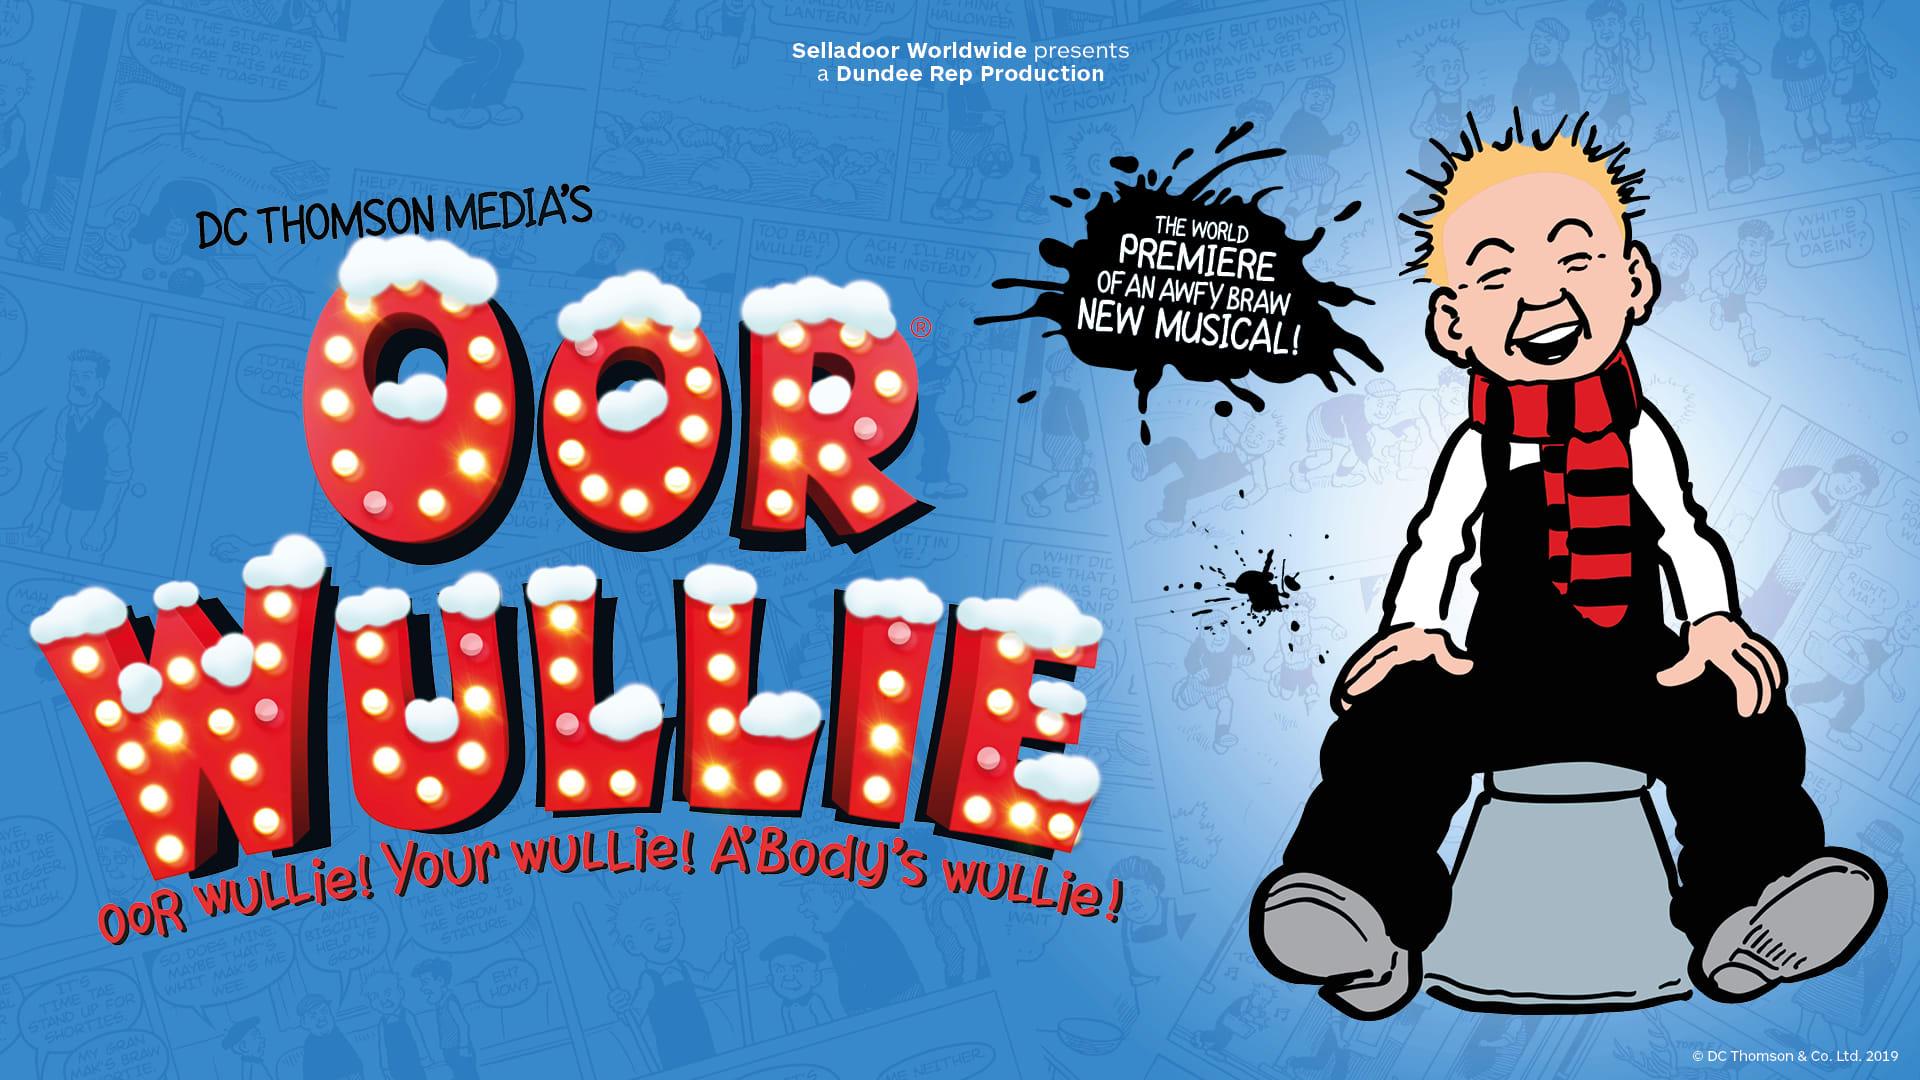 Oor Wullie title